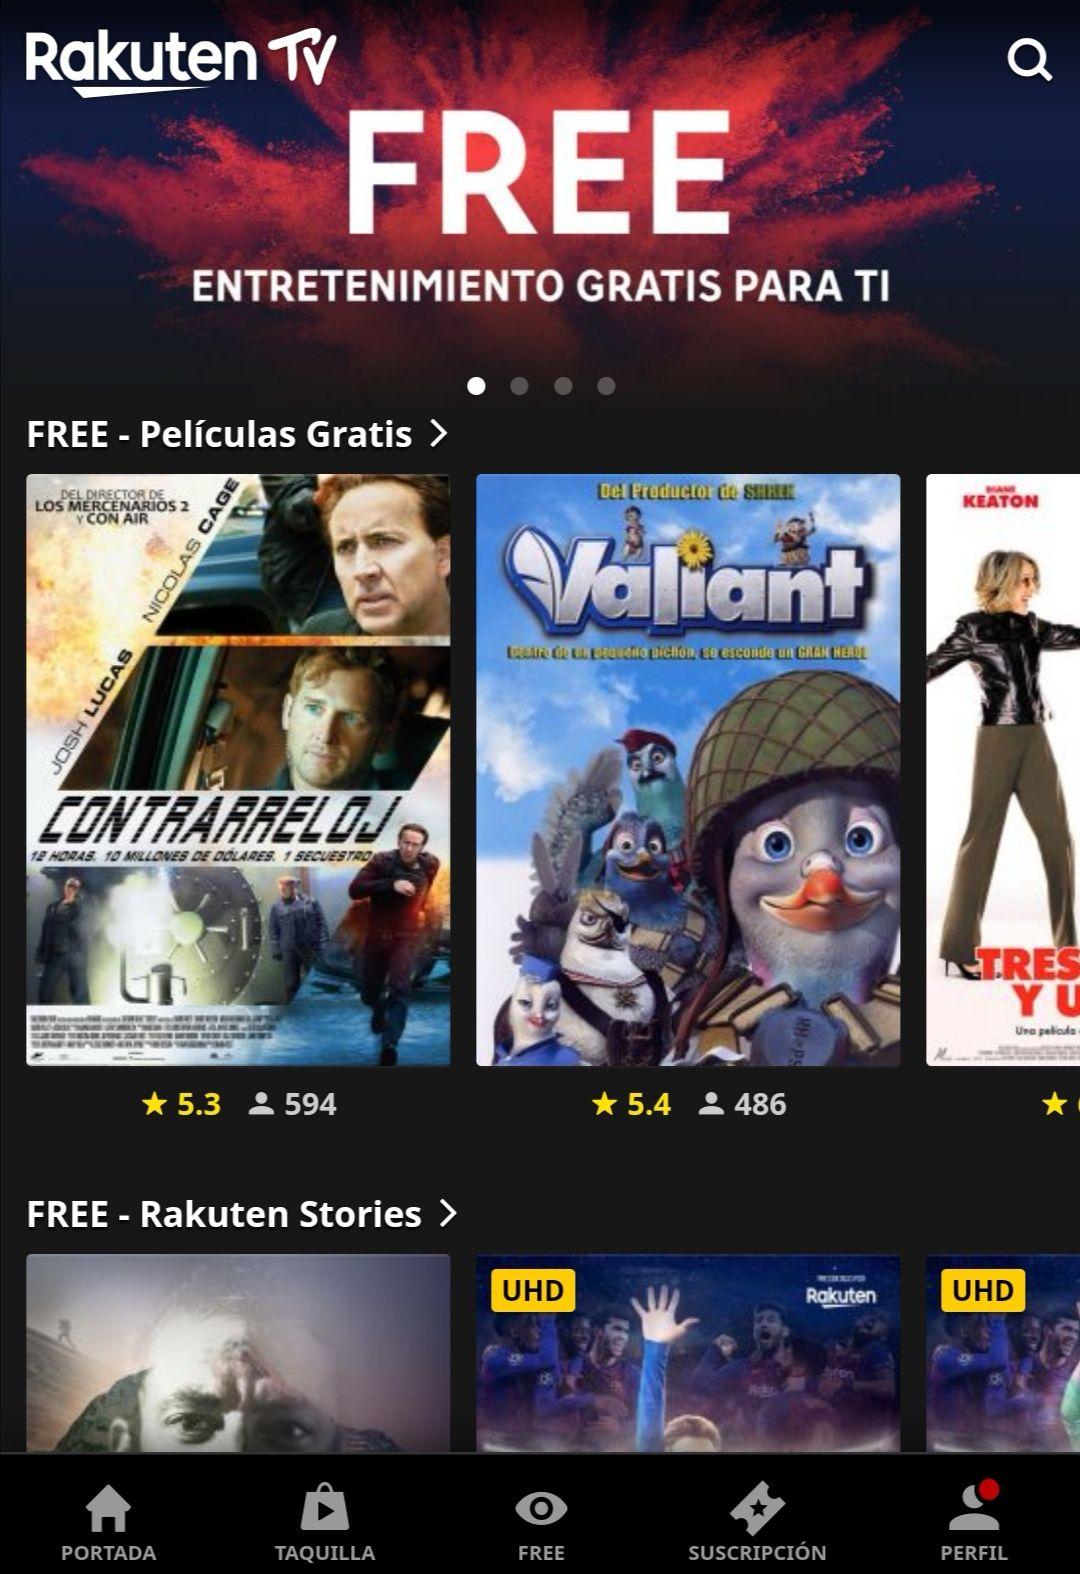 Películas gratis en Rakuten.tv